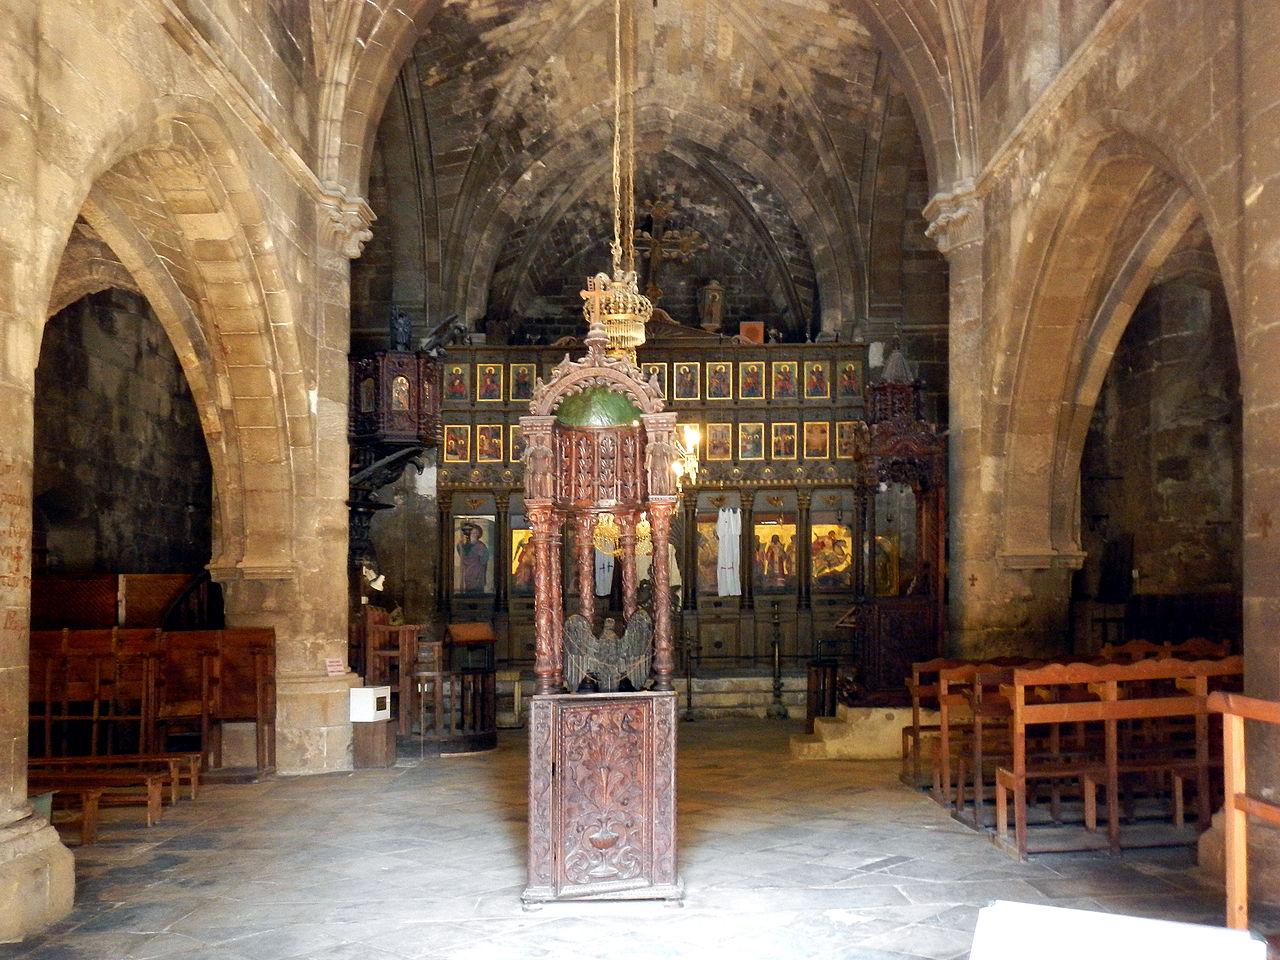 Аббатство Беллапаис, интерьер церкви